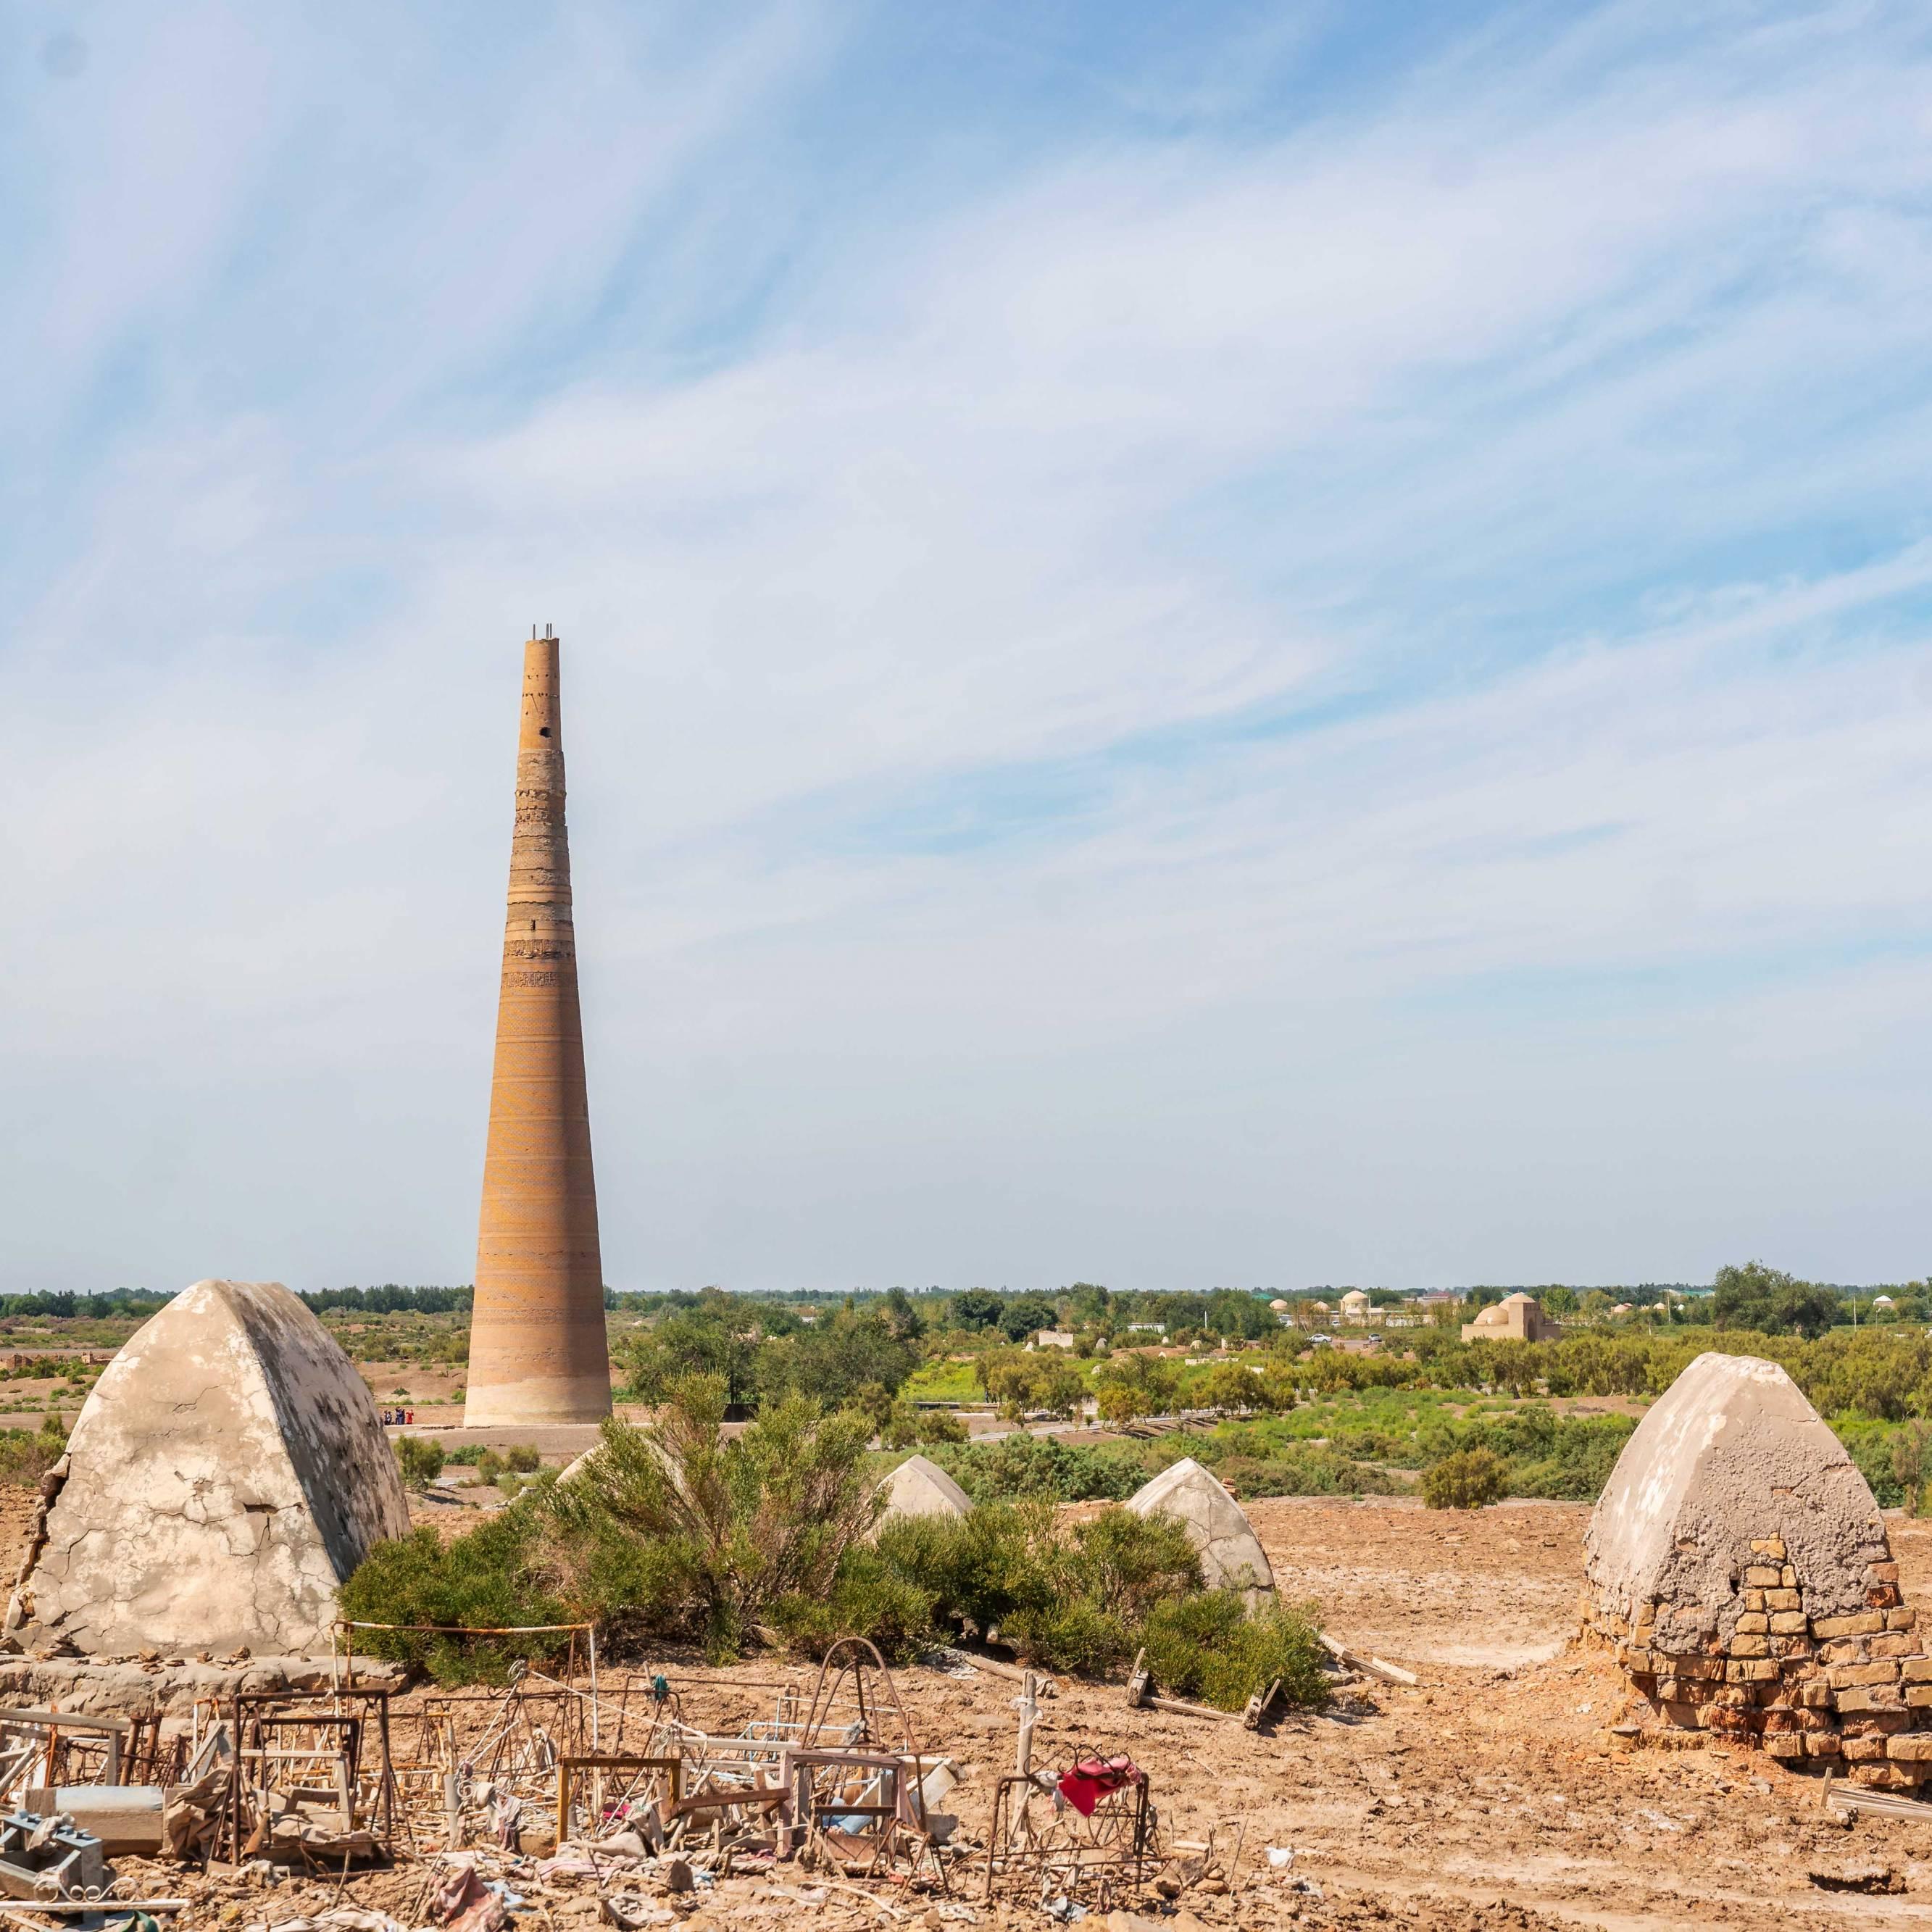 Highest ancient minaret in Central Asia, Kunya Urgench